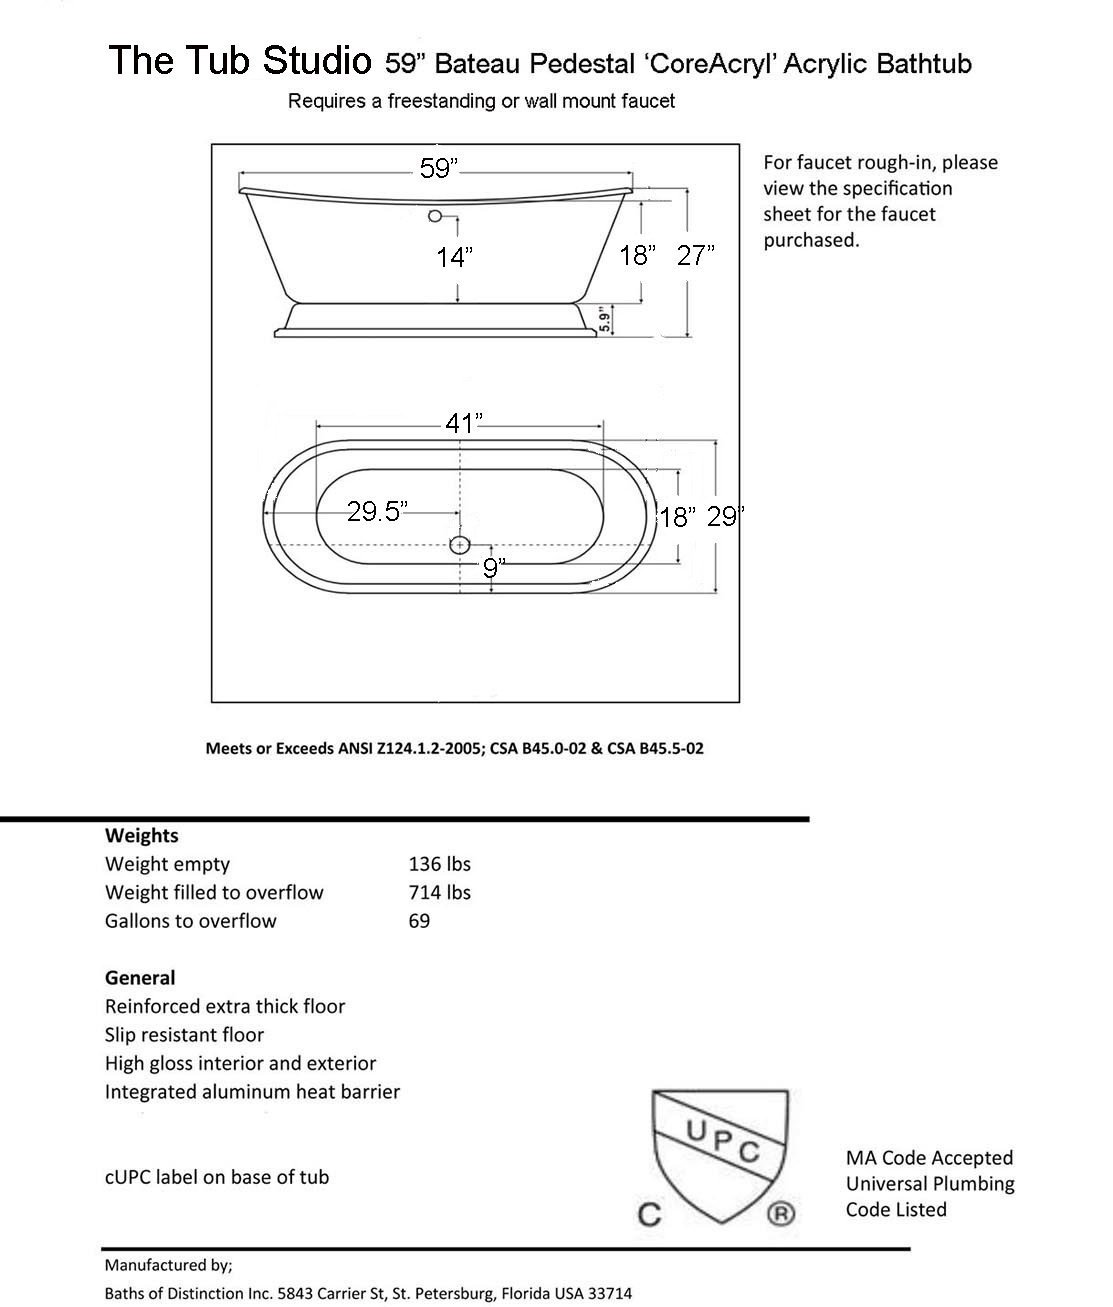 39 isabetta 39 coreacryl acrylic white pedestal tub for Freestanding tub dimensions